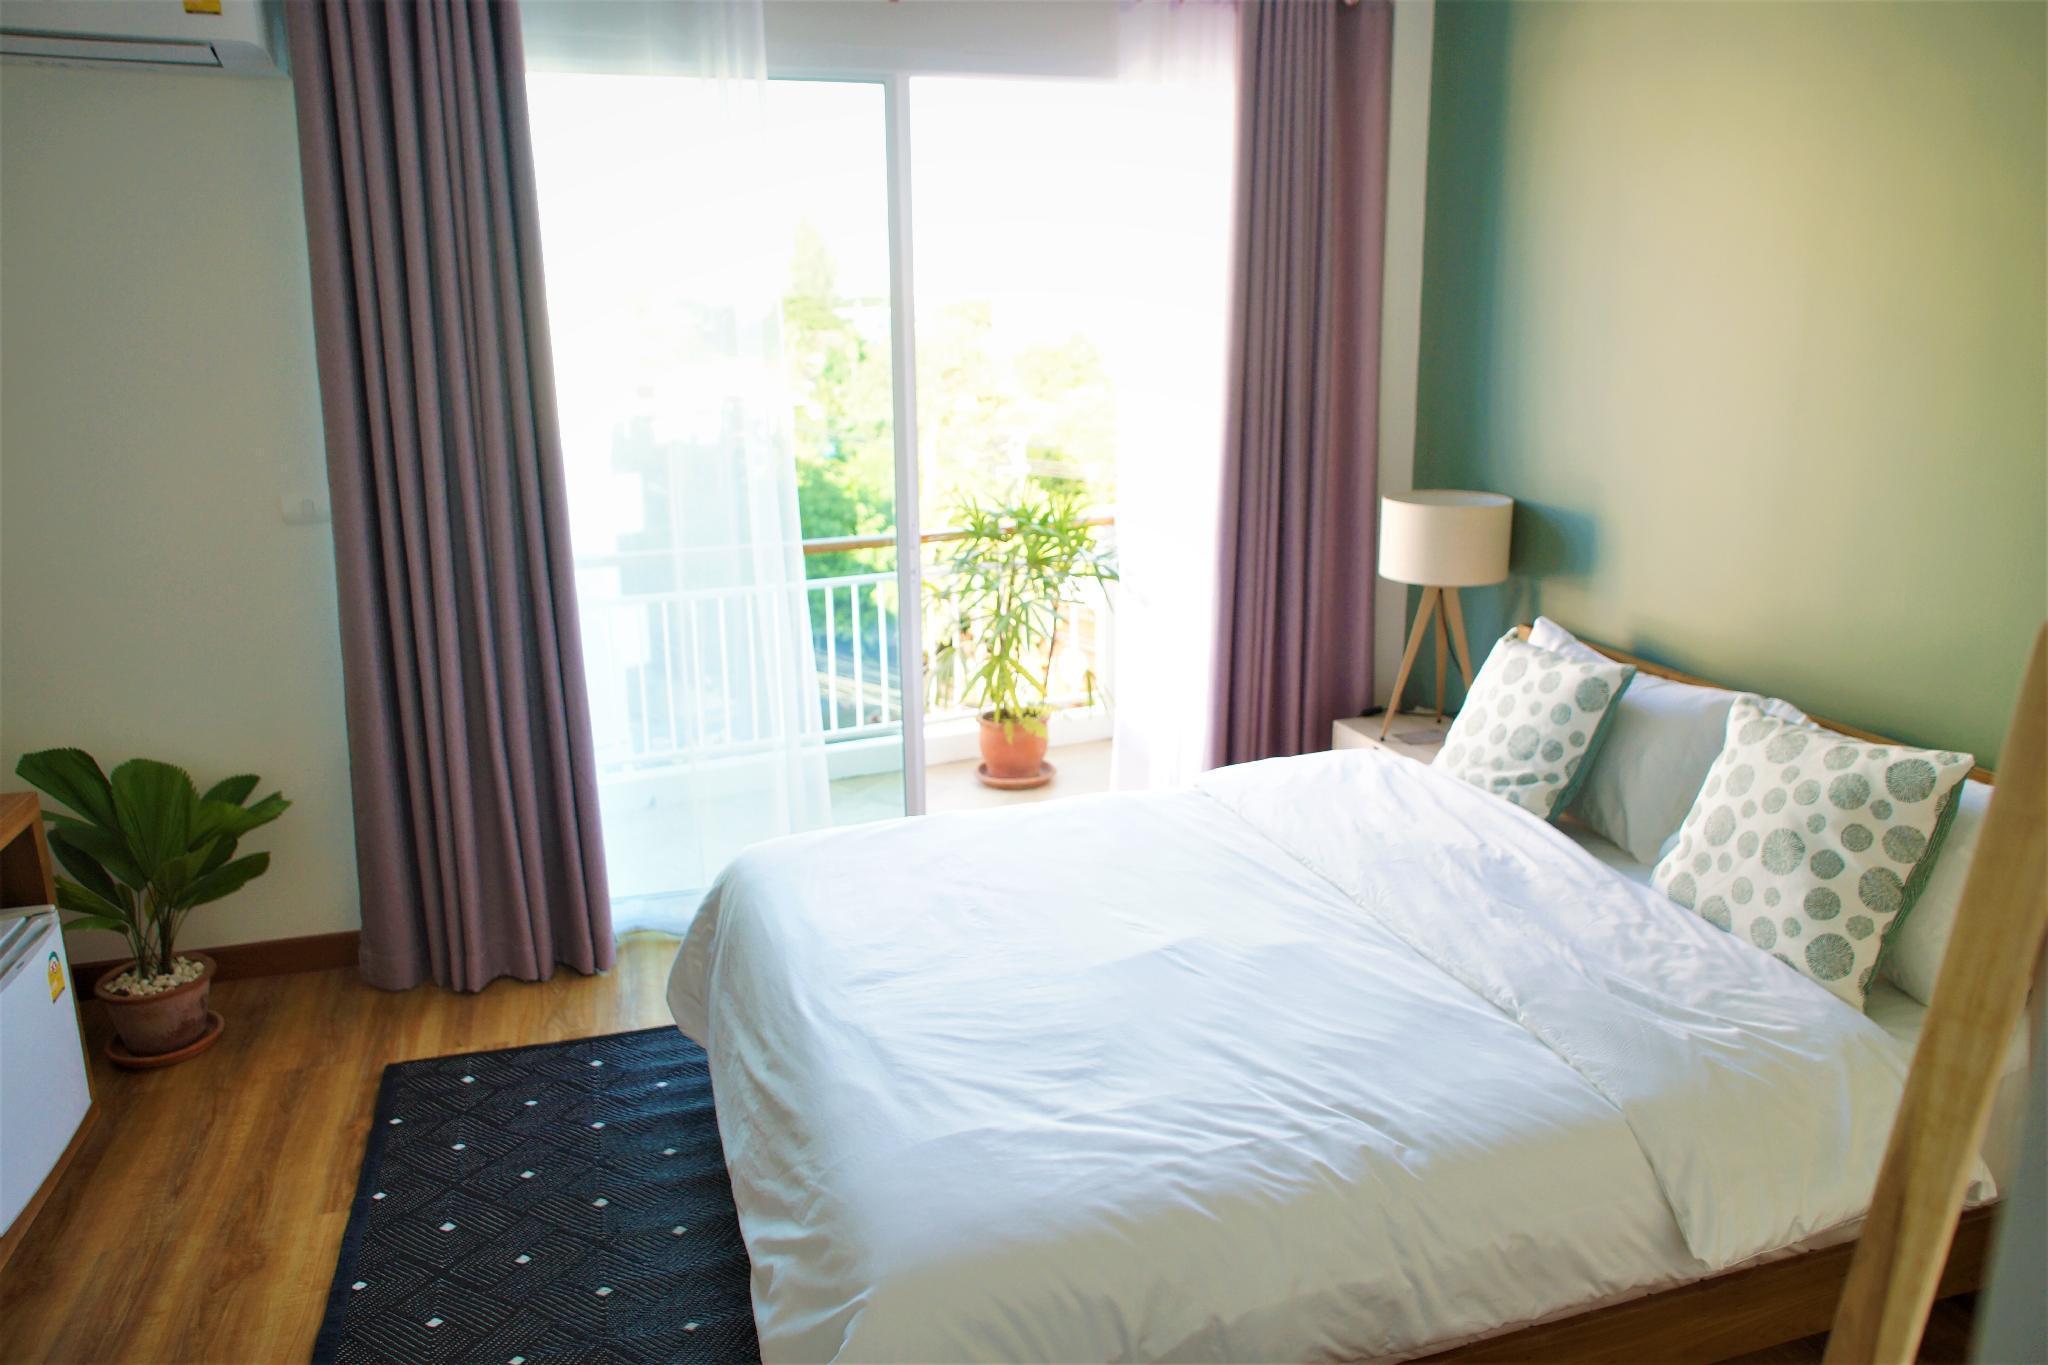 Breadfruit / Standard Room for One Person 401 สตูดิโอ อพาร์ตเมนต์ 1 ห้องน้ำส่วนตัว ขนาด 18 ตร.ม. – นิมมานเหมินทร์